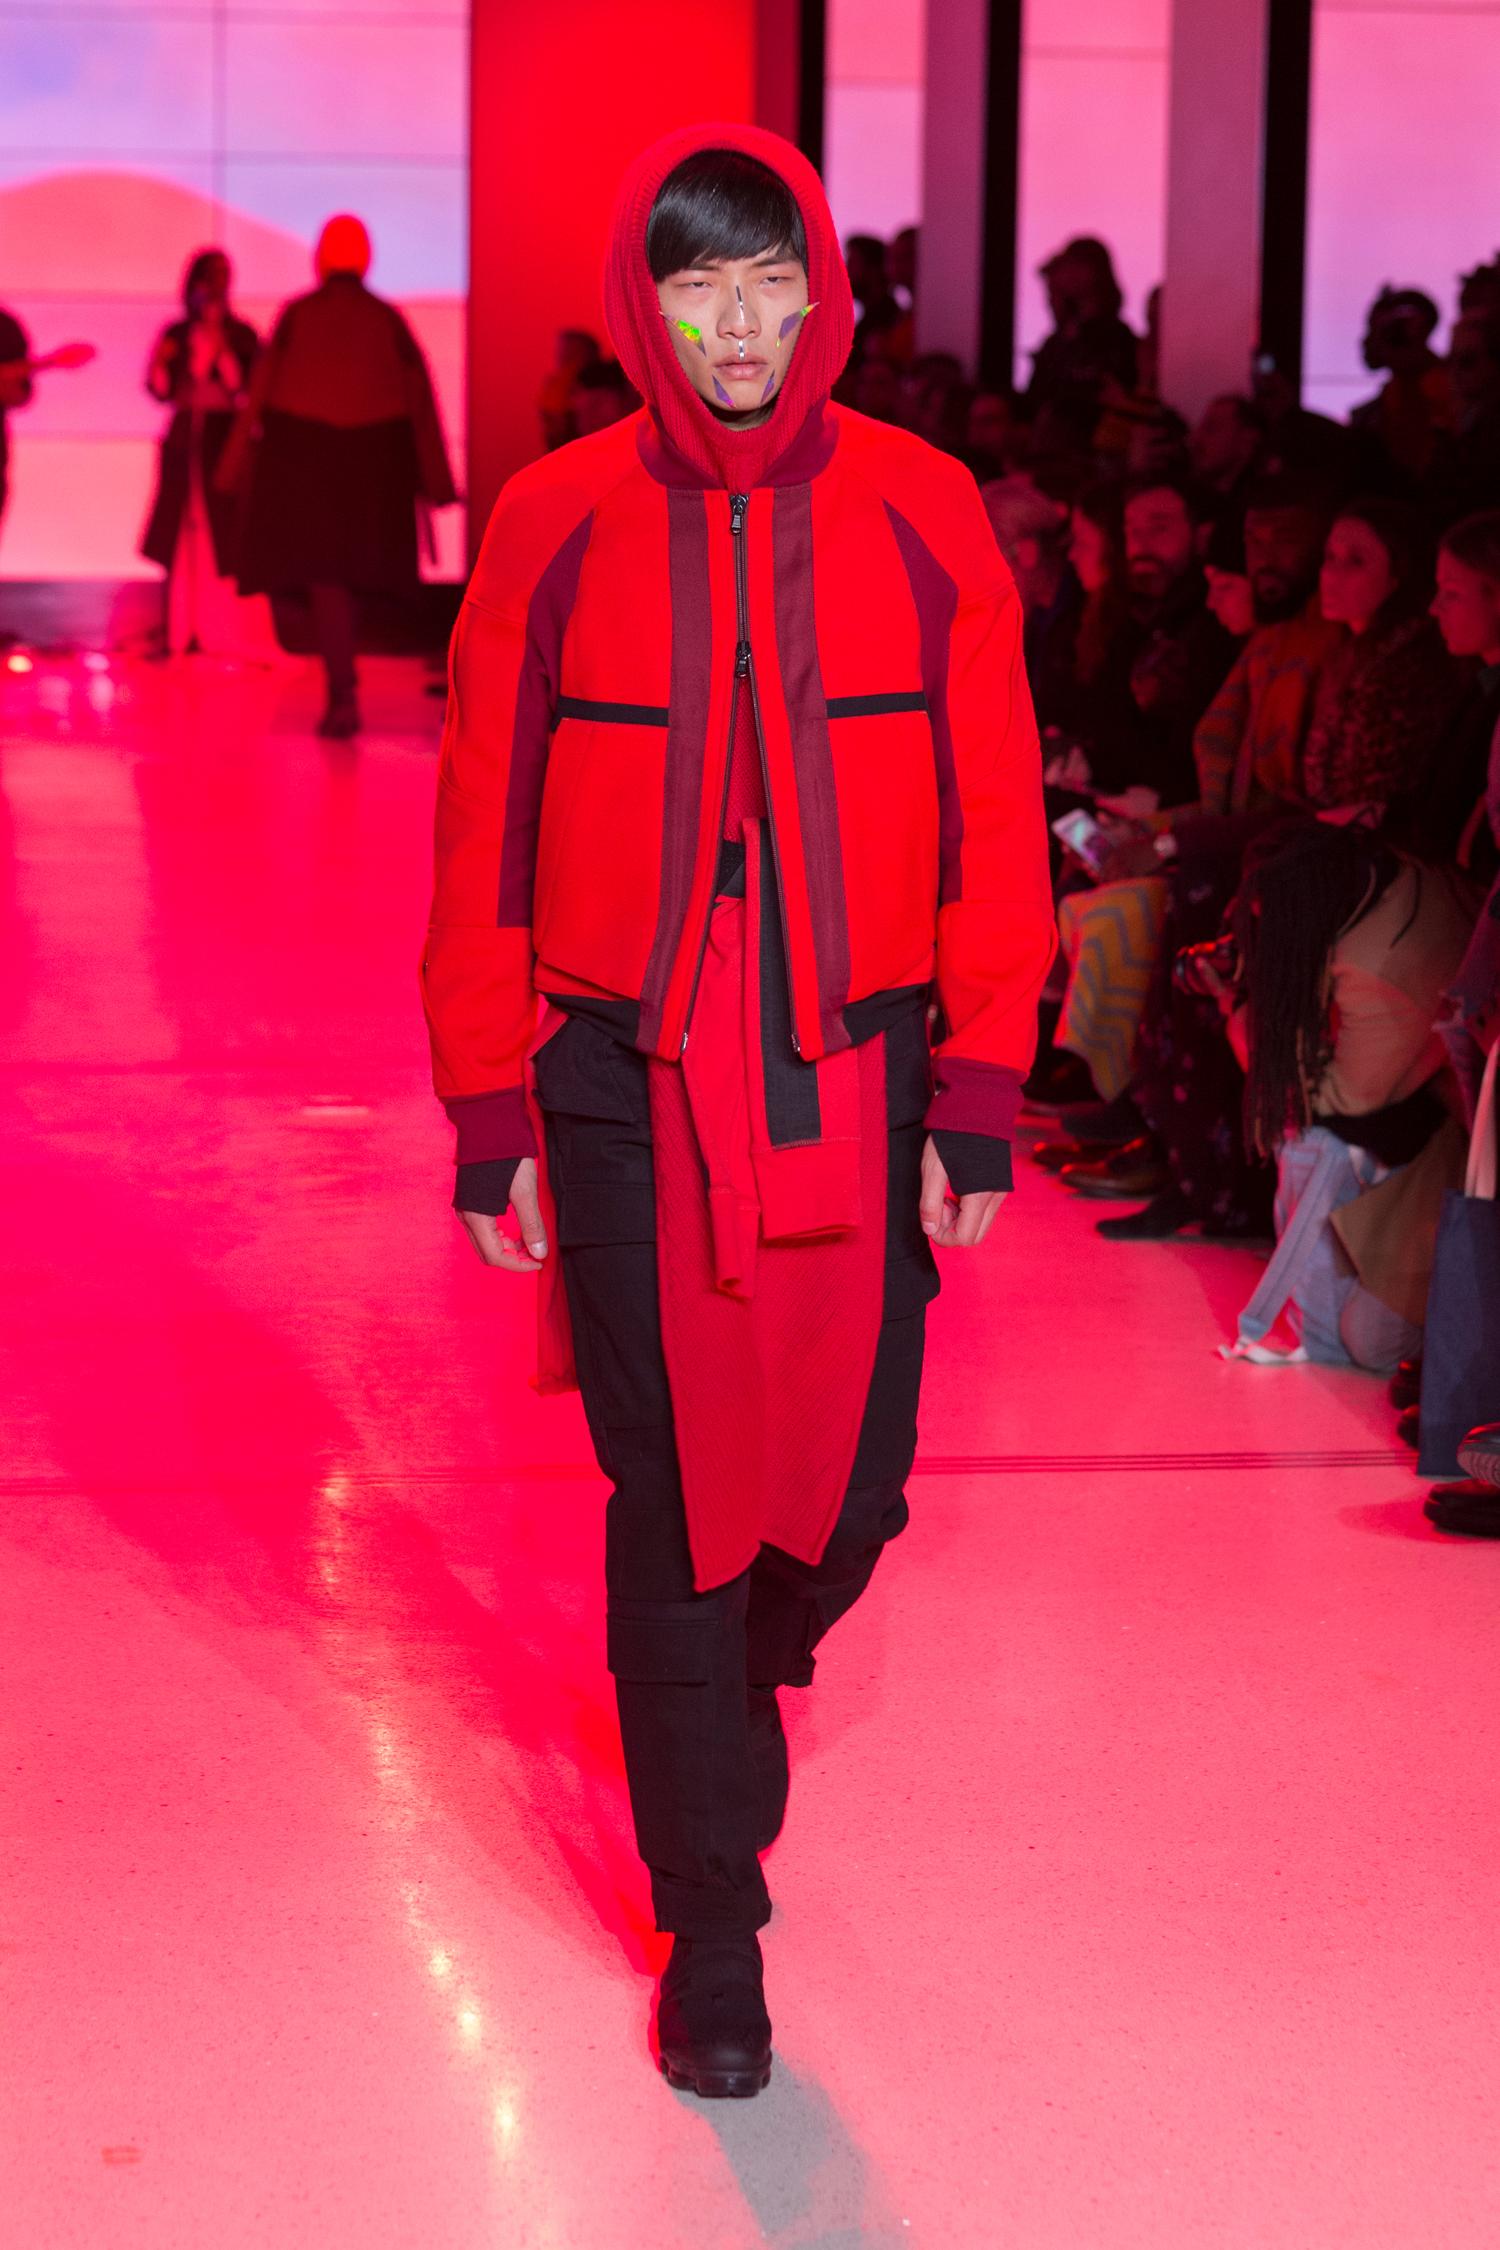 LOOK 19   ARC Flight Jacket  / Crimson Red   ARC Hooded Tunic  / Red   ARC Long Sleeve Tee  / Black   ARC Long Sleeve Tee  (Worn on Waist) / Crimson Red   ARC Tactical Pant  / Black Denim   Nike Air VaporMax Utility